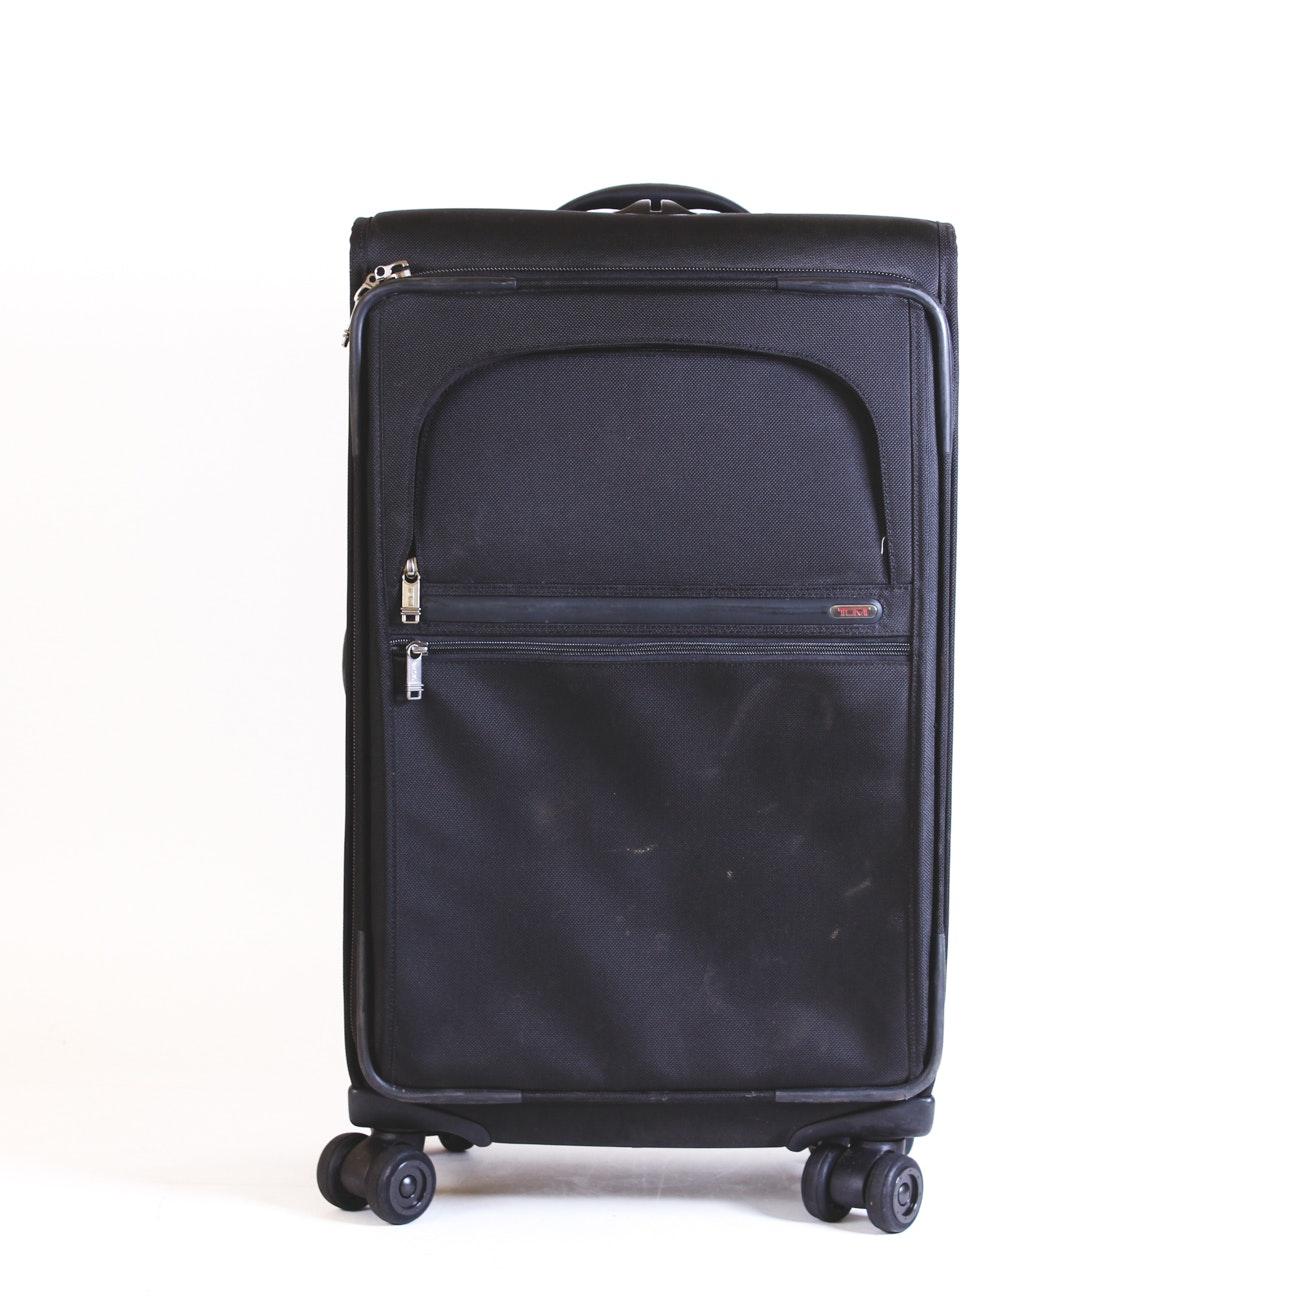 Tumi Black Nylon Roller Bag